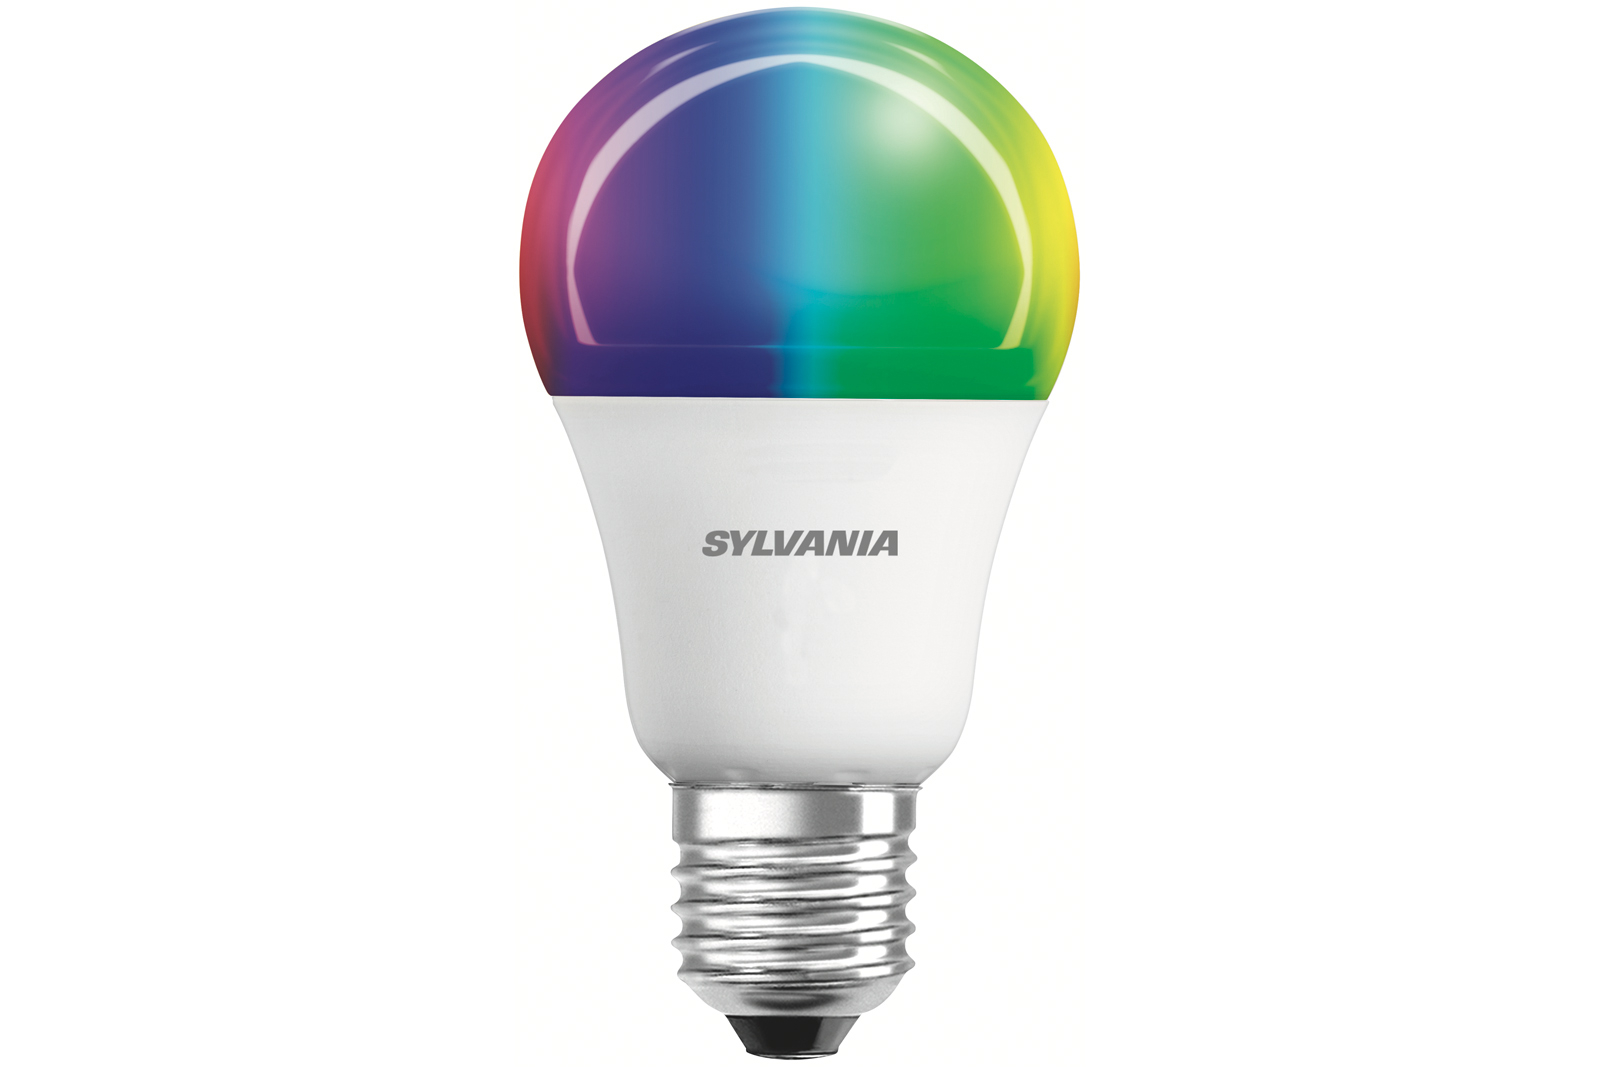 Sylvania Smart Bulb